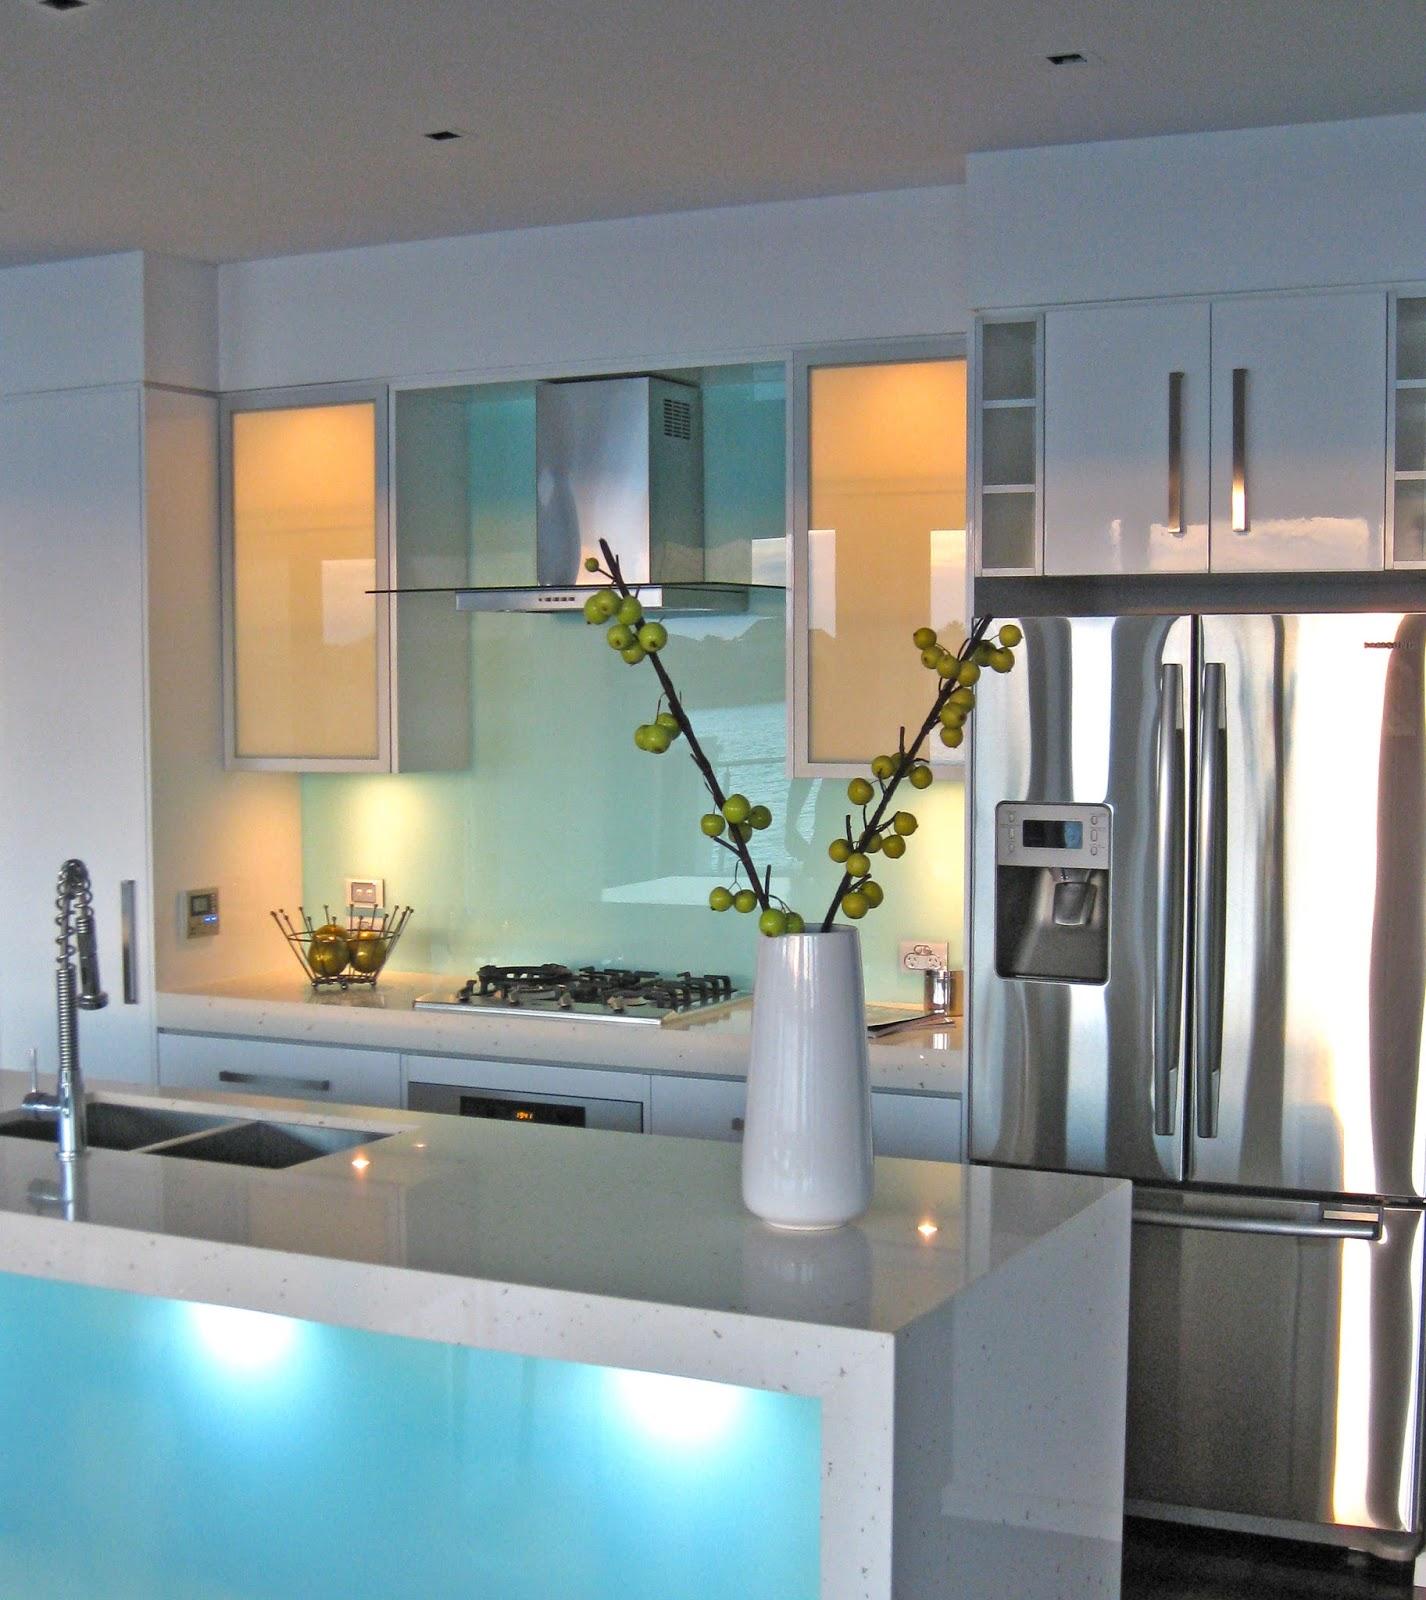 Taste Kitchens: Renovating The House With Modular Kitchen